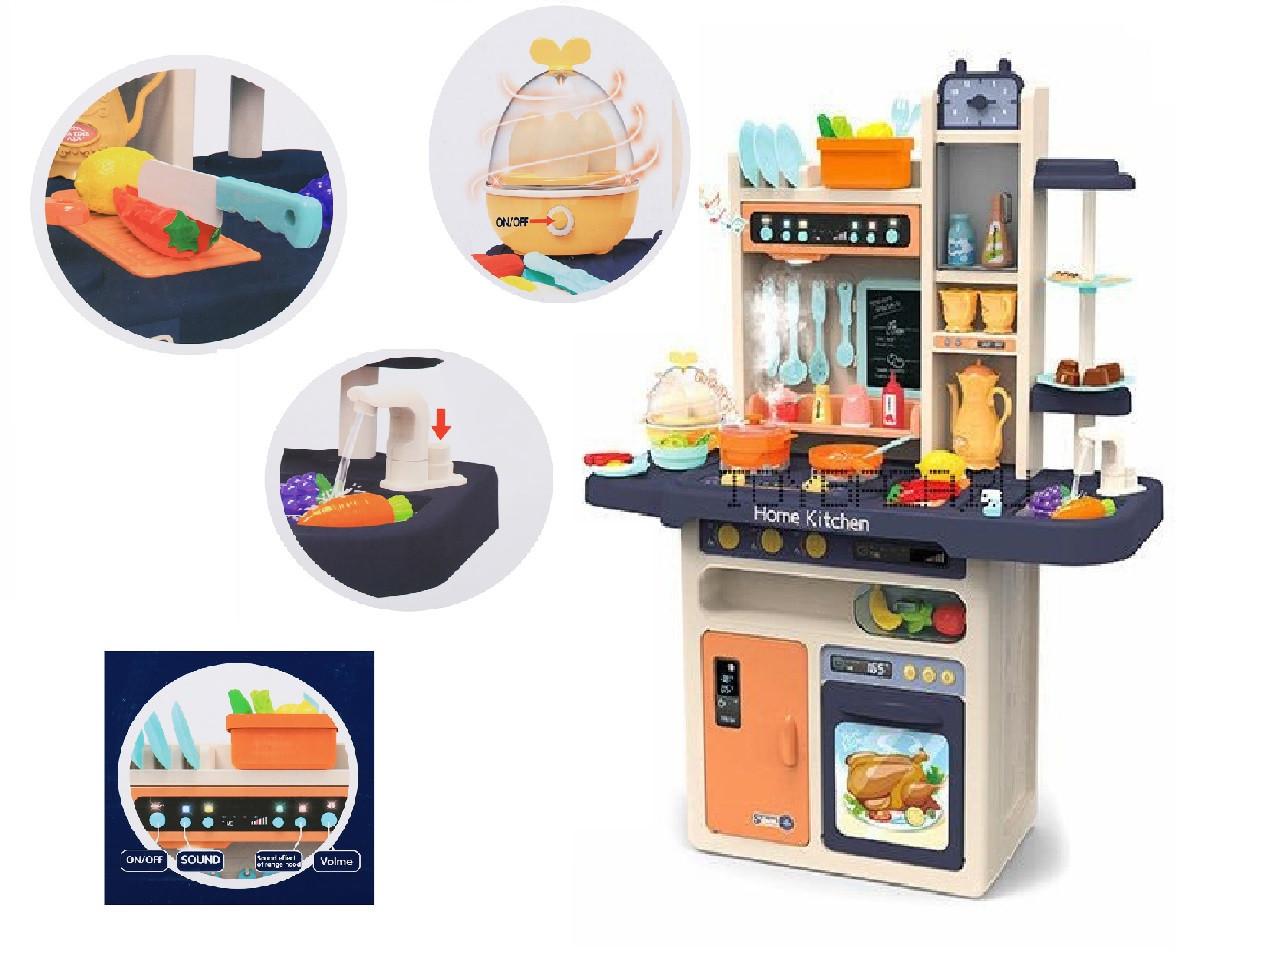 Кухня Детская звуковая вода, звук, свет Home Kitchen 889-155